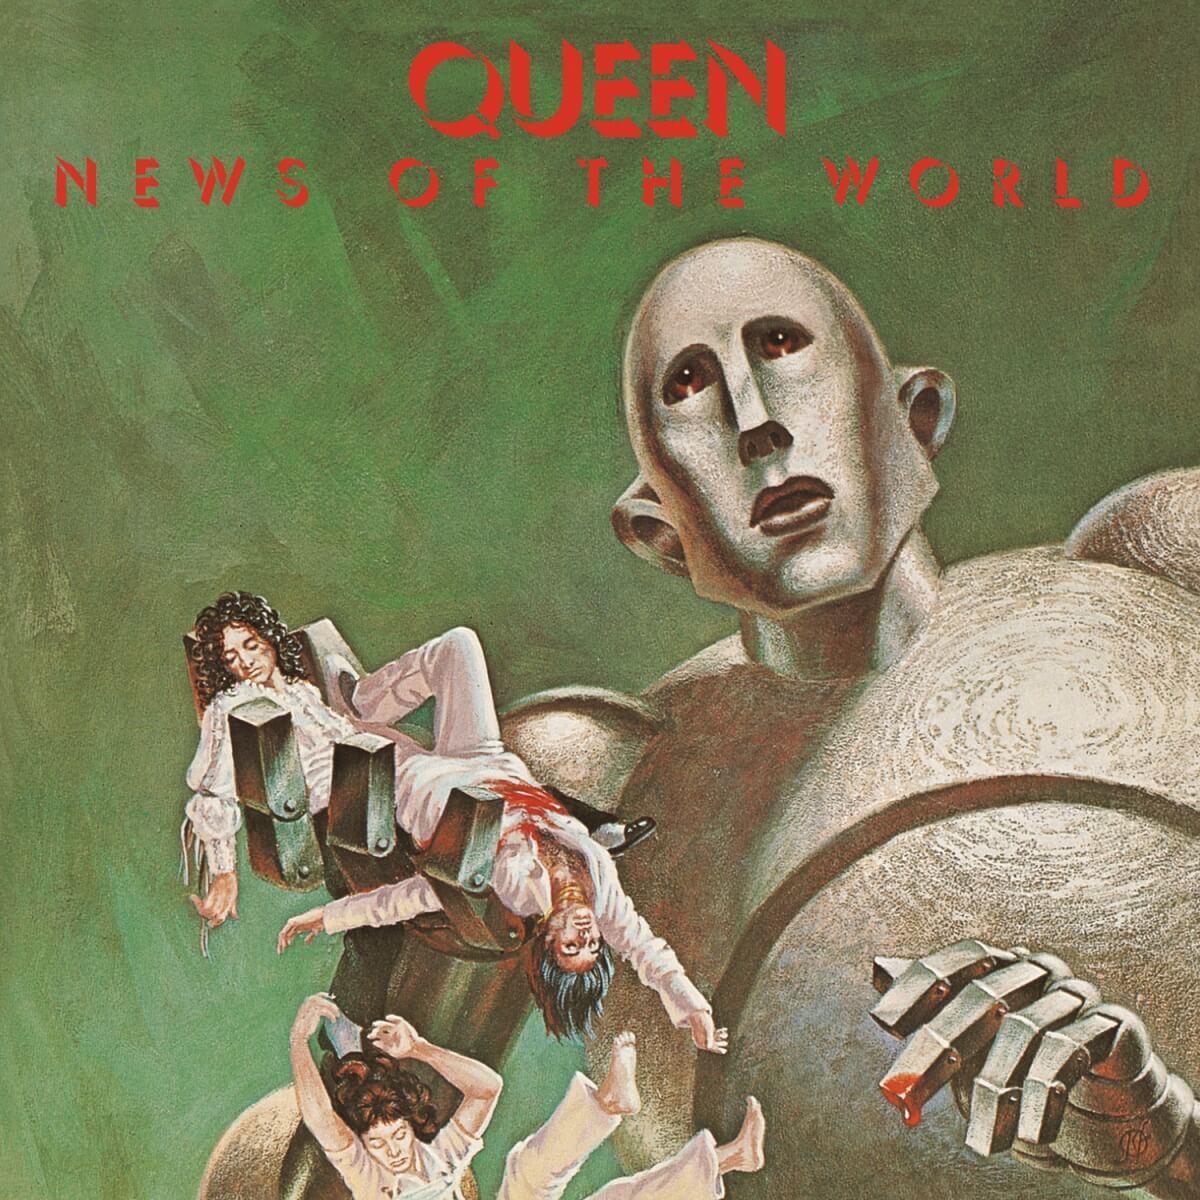 Queen - News Of The World|ジャケット画像